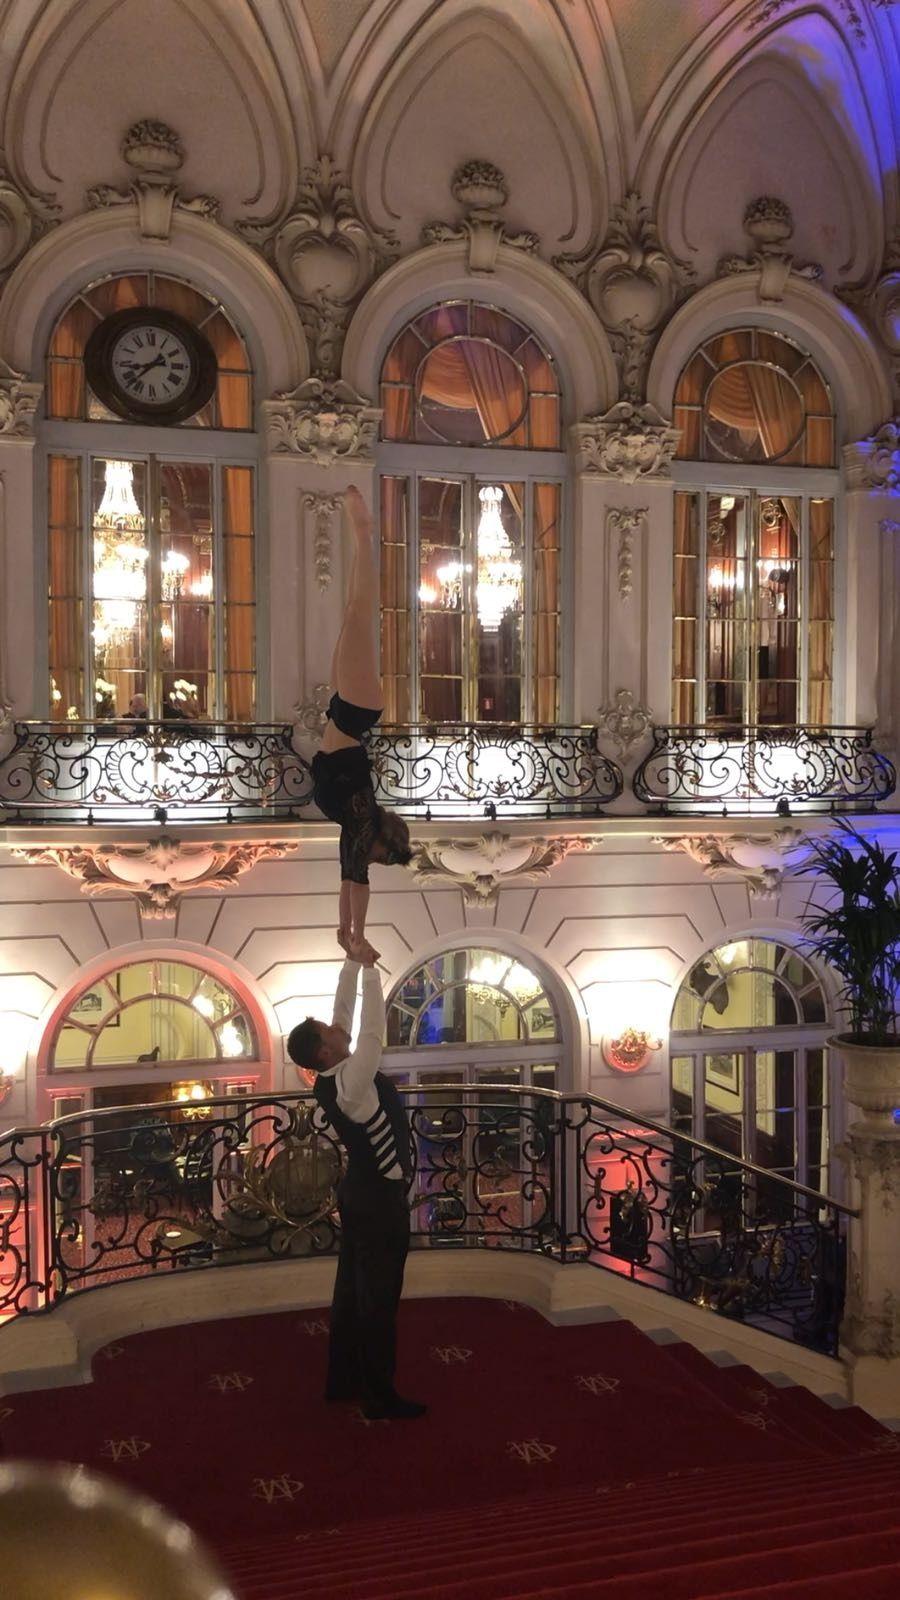 Dancem's acrobats at the Casino de Madrid